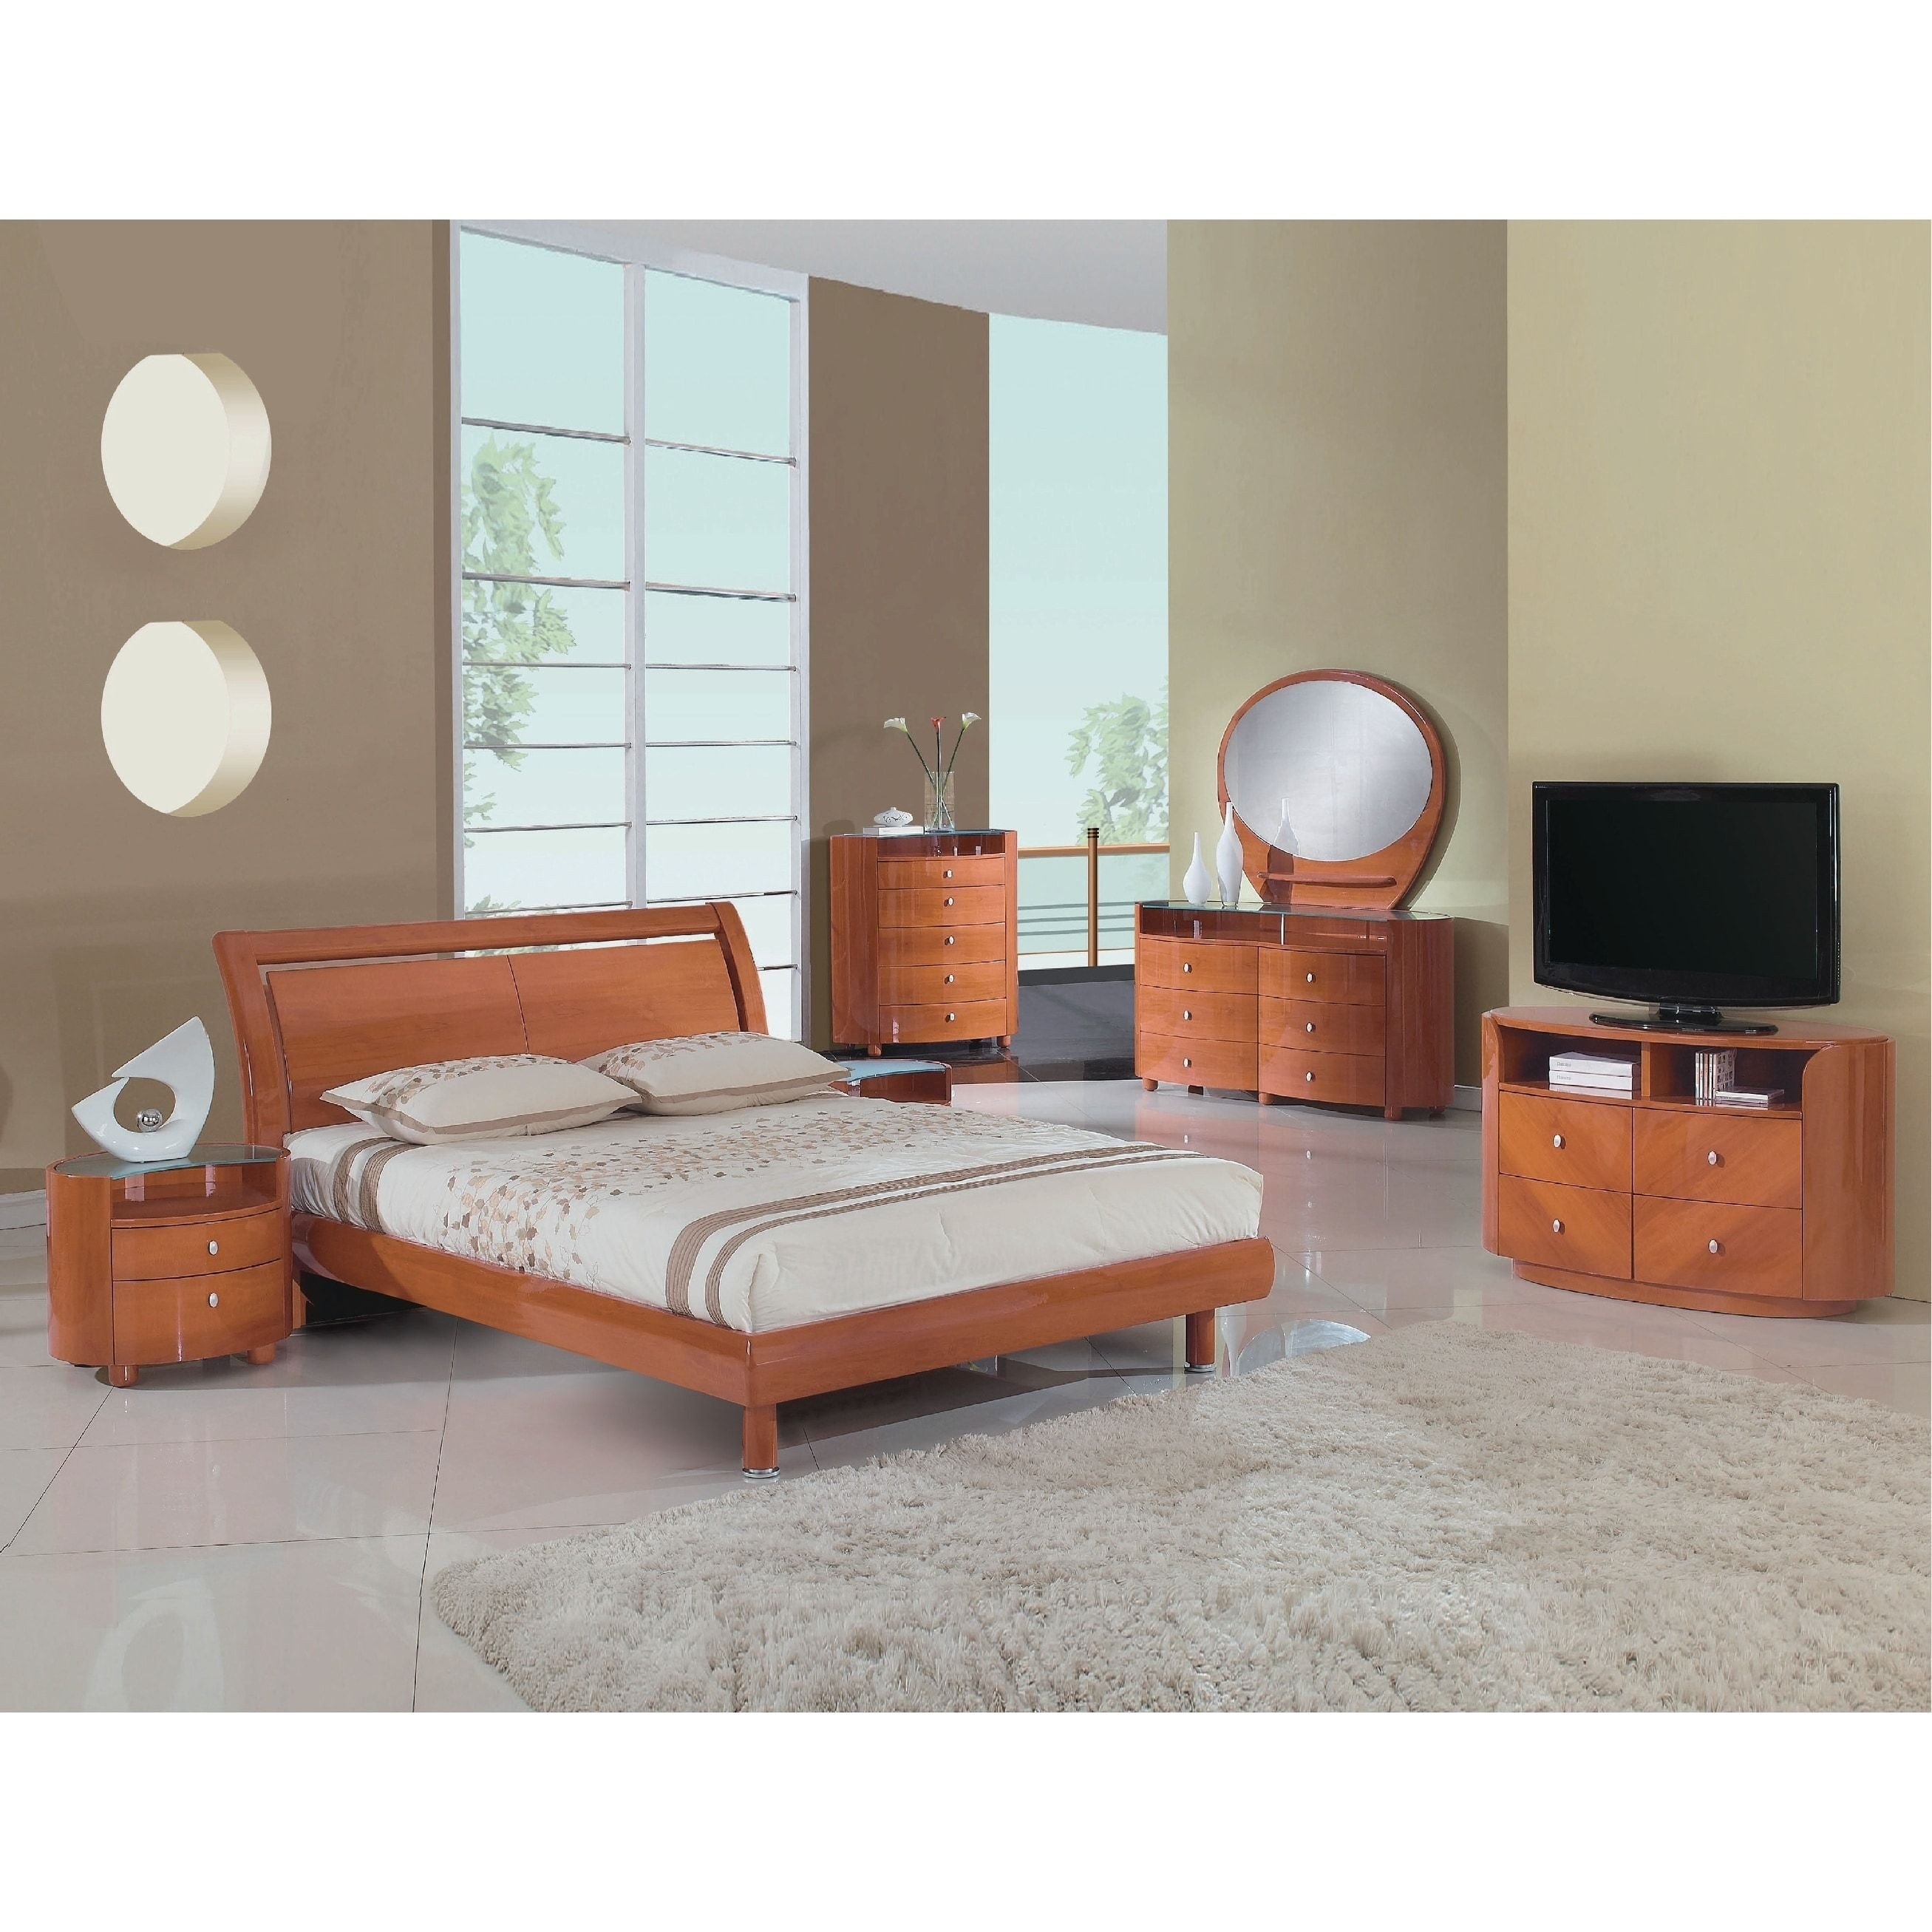 Cheap Modern Bedroom Set Inspirational Line Shopping Bedding Furniture Electronics Jewelry